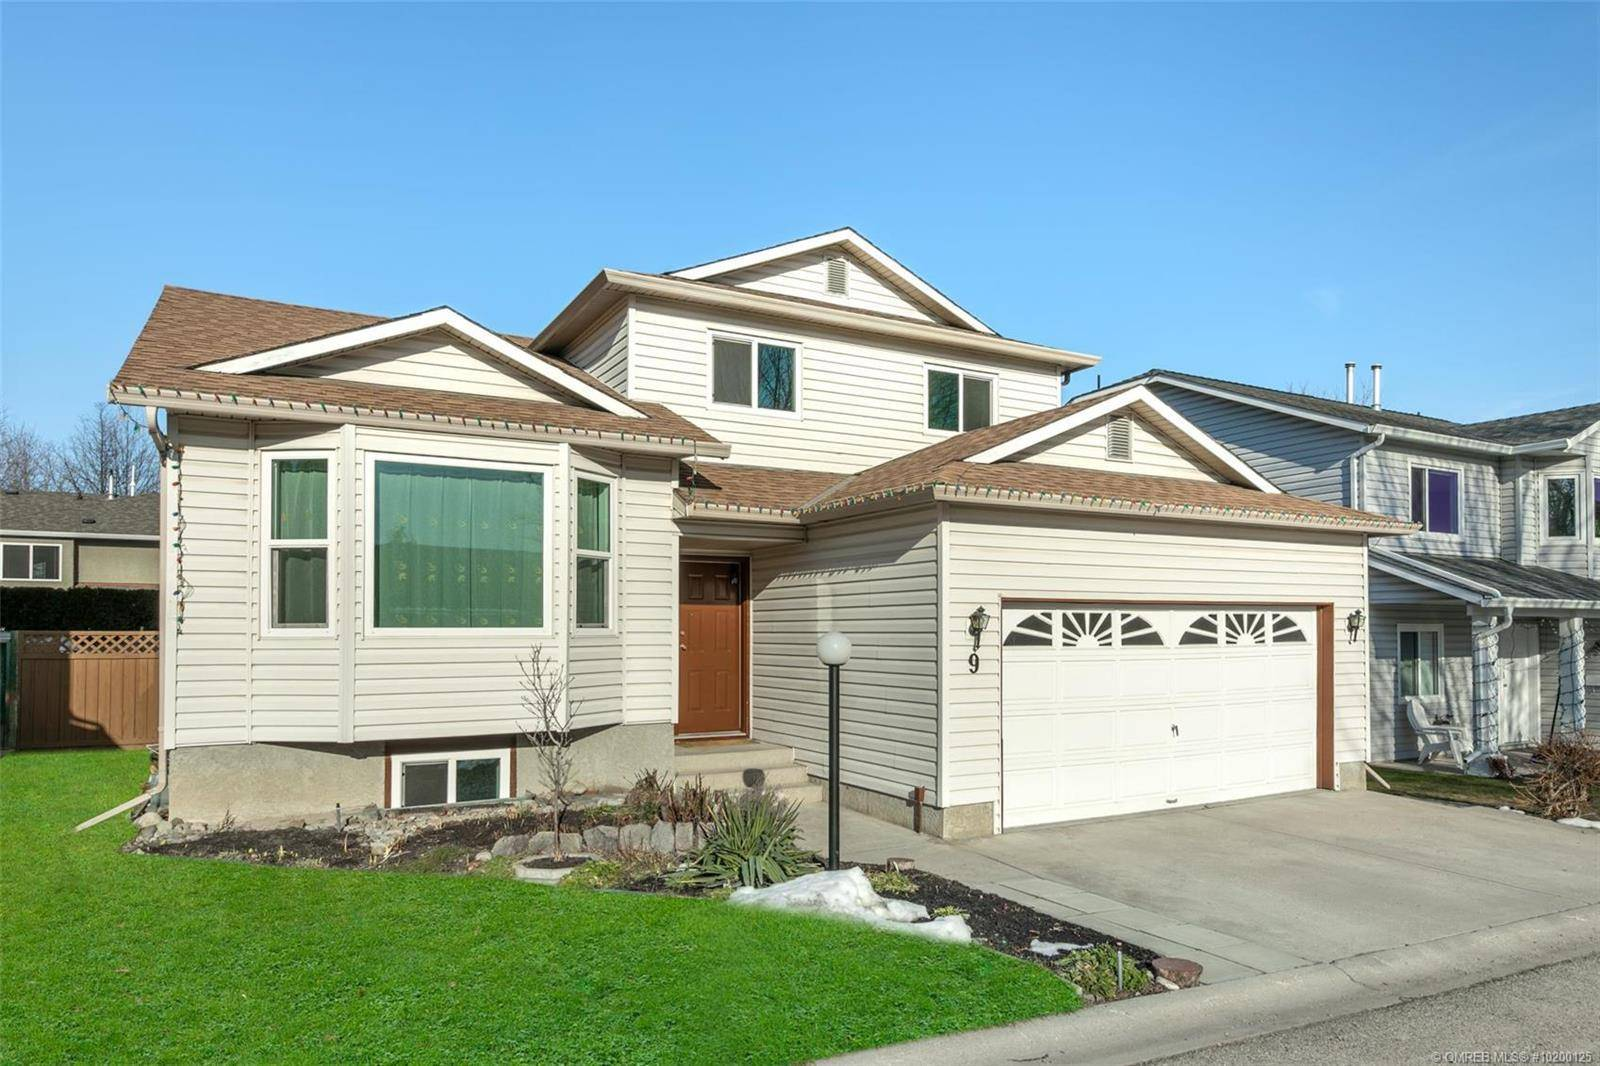 House for sale at 555 Glenmeadows Rd Unit 9 Kelowna British Columbia - MLS: 10200125